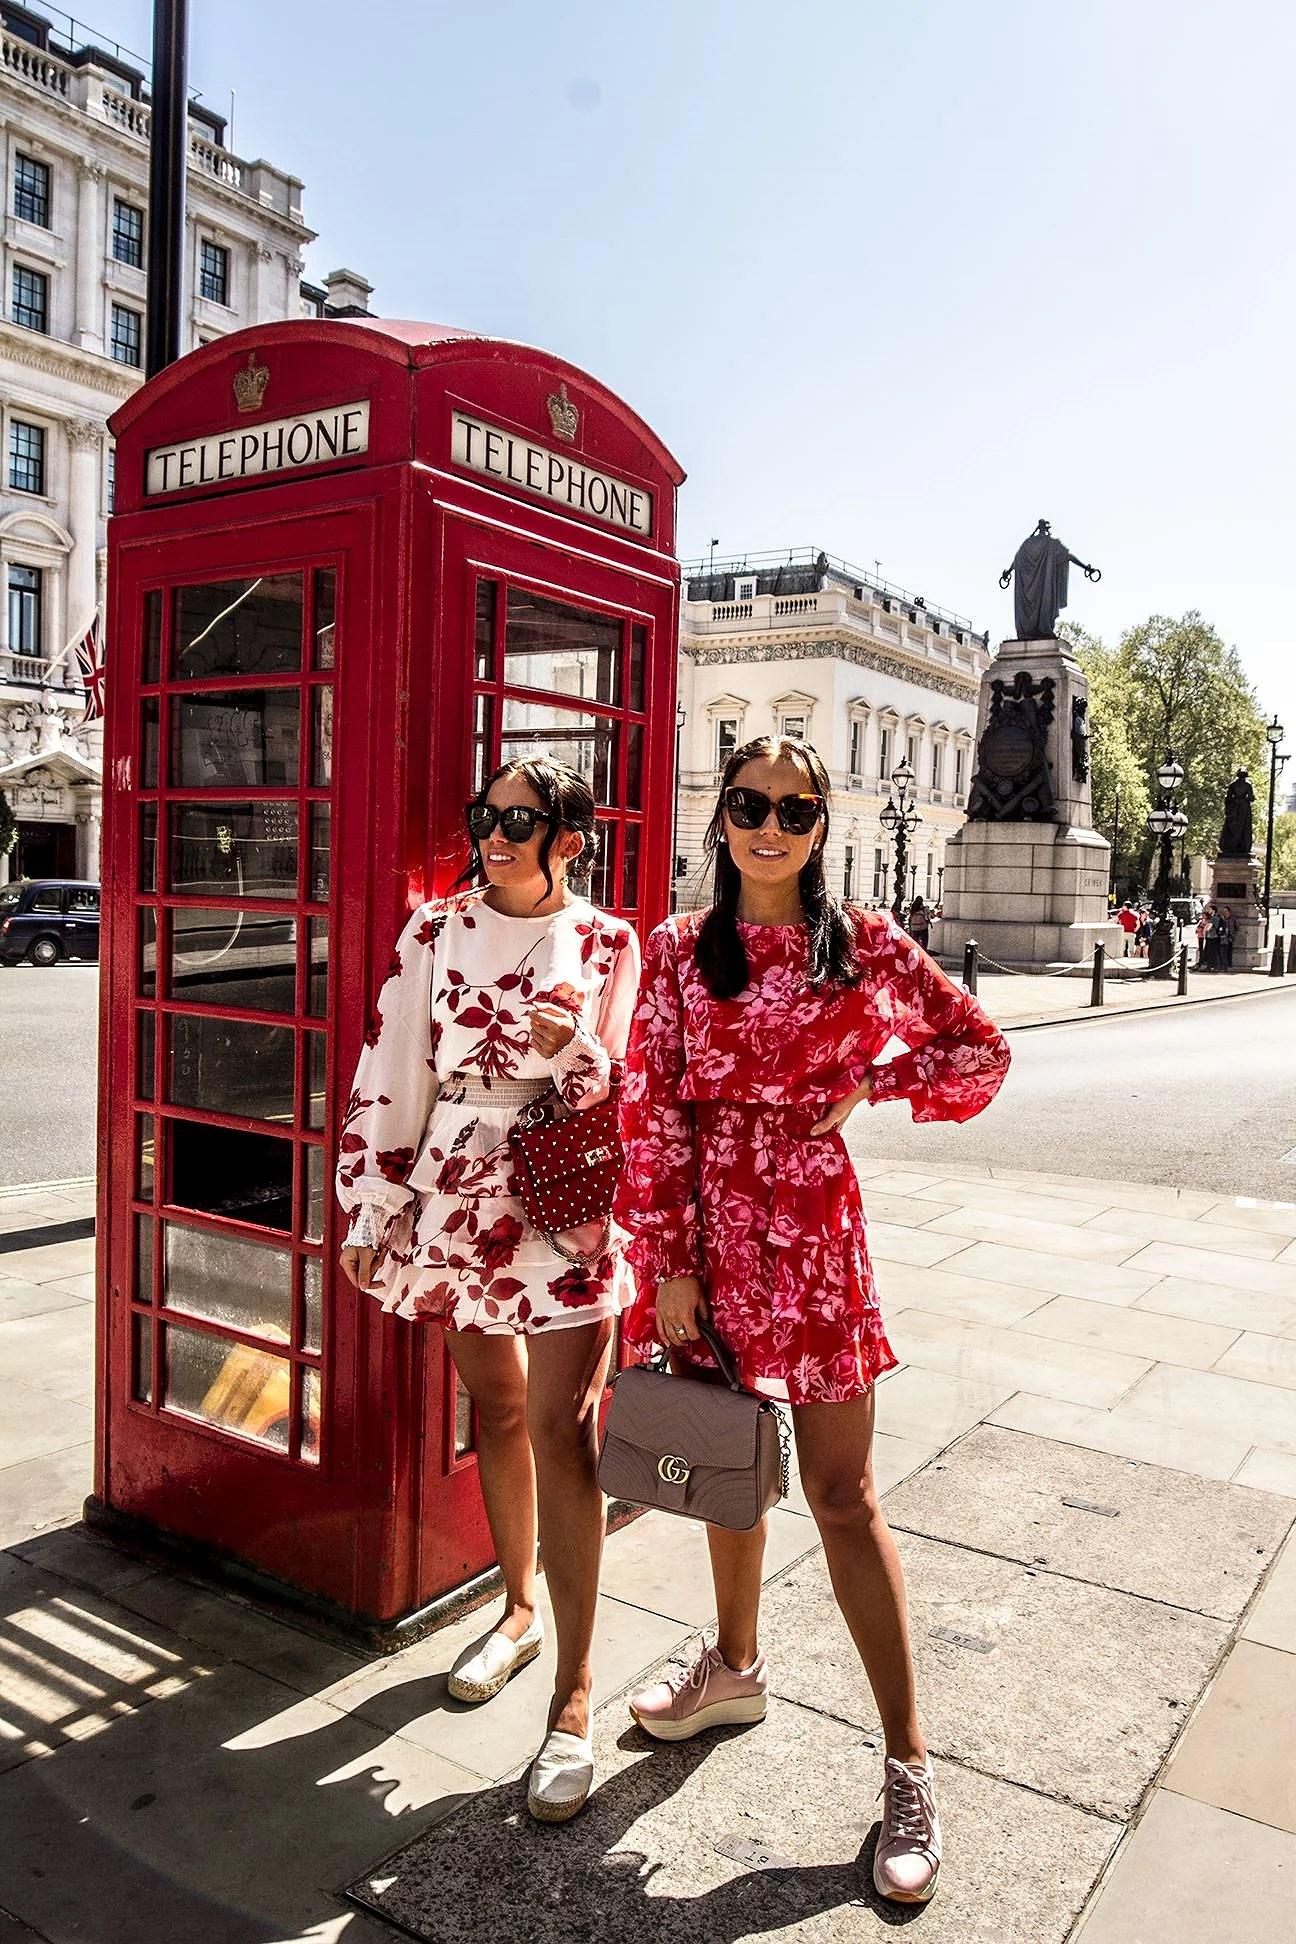 W - + & - ABOUT LONDON